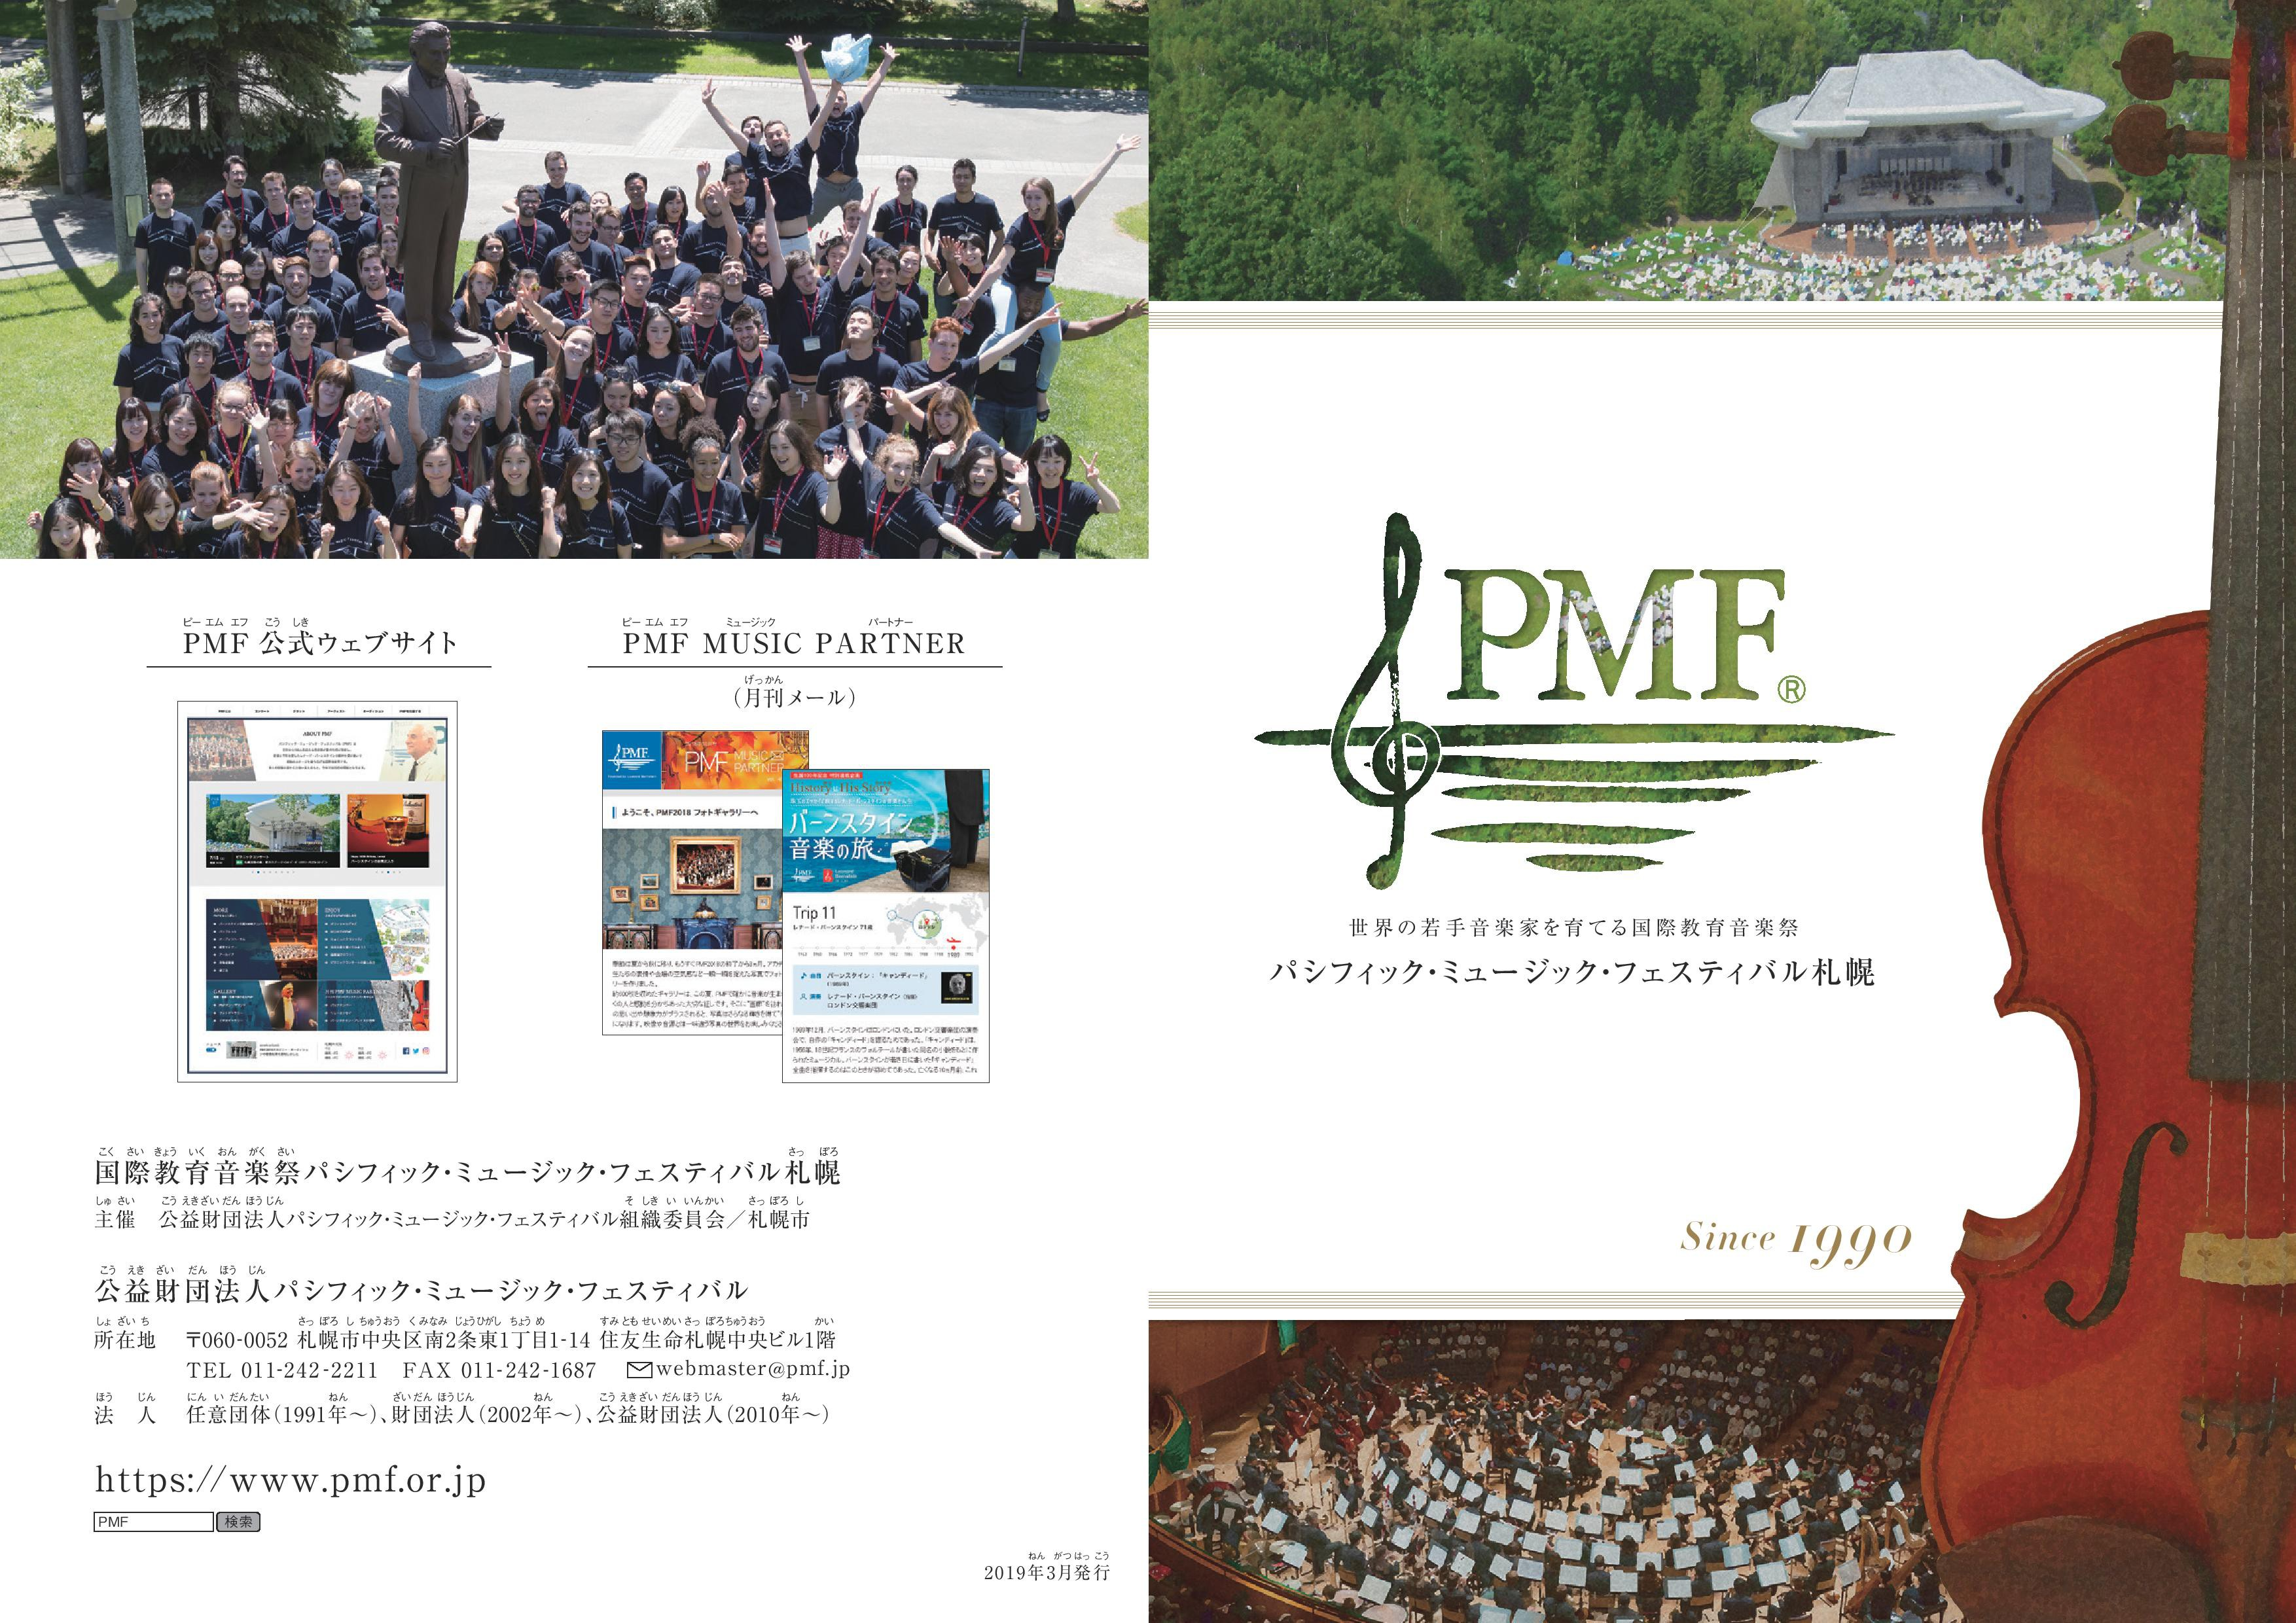 PMF新概要リーフレット 1枚目